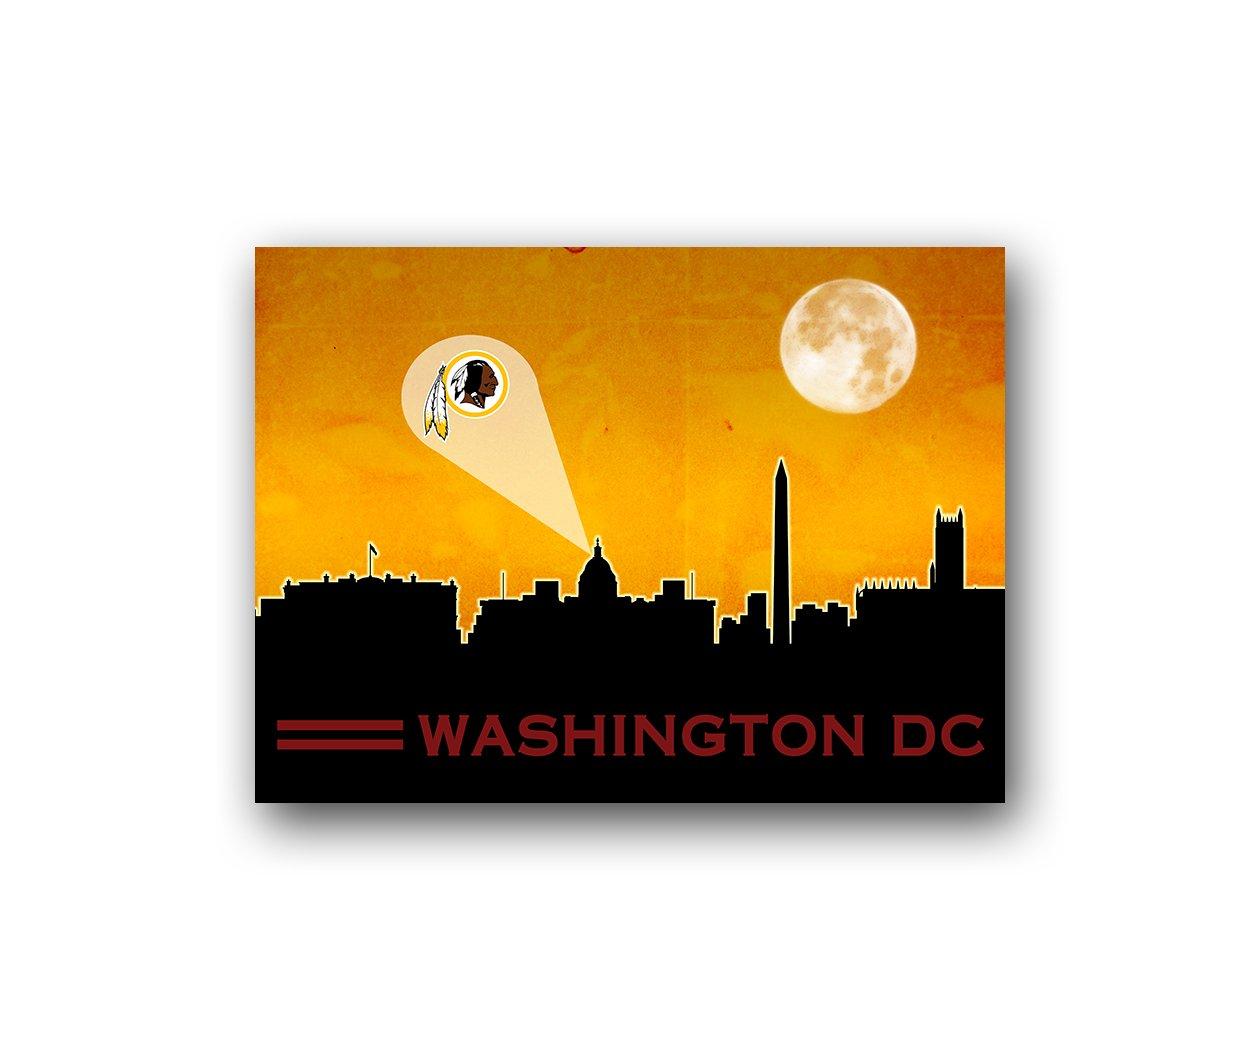 Amazon.com : Washington DC Redskins Poster Sports Art City Skyline ...